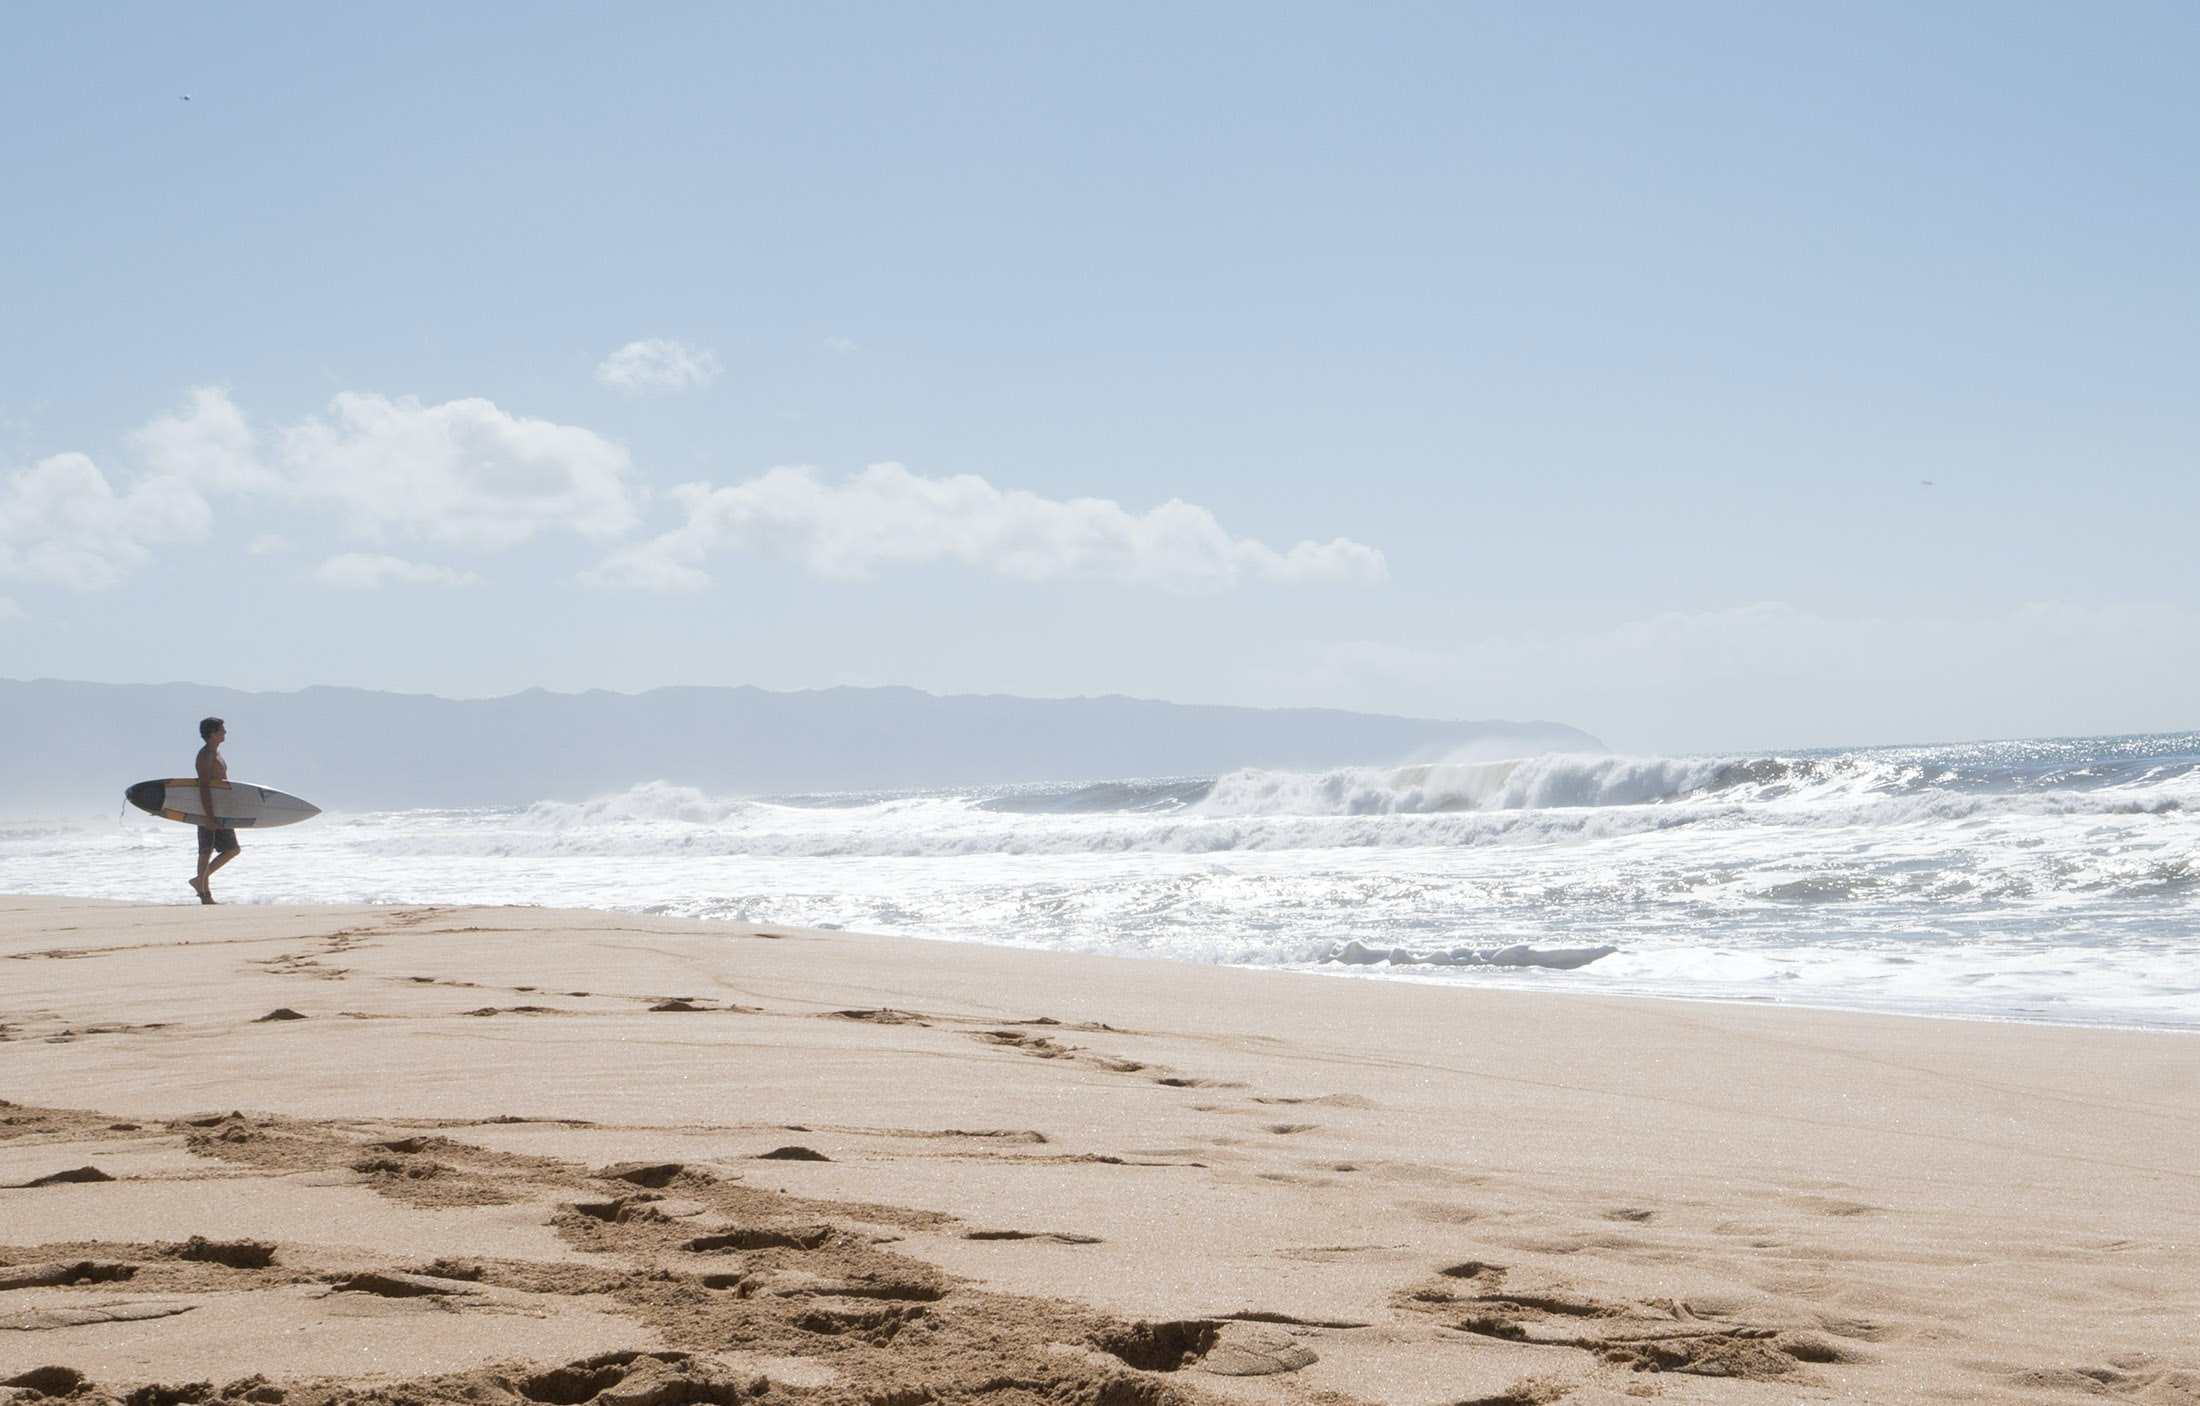 Surfer on the sand beach in O'ahu walking towards rough ocean